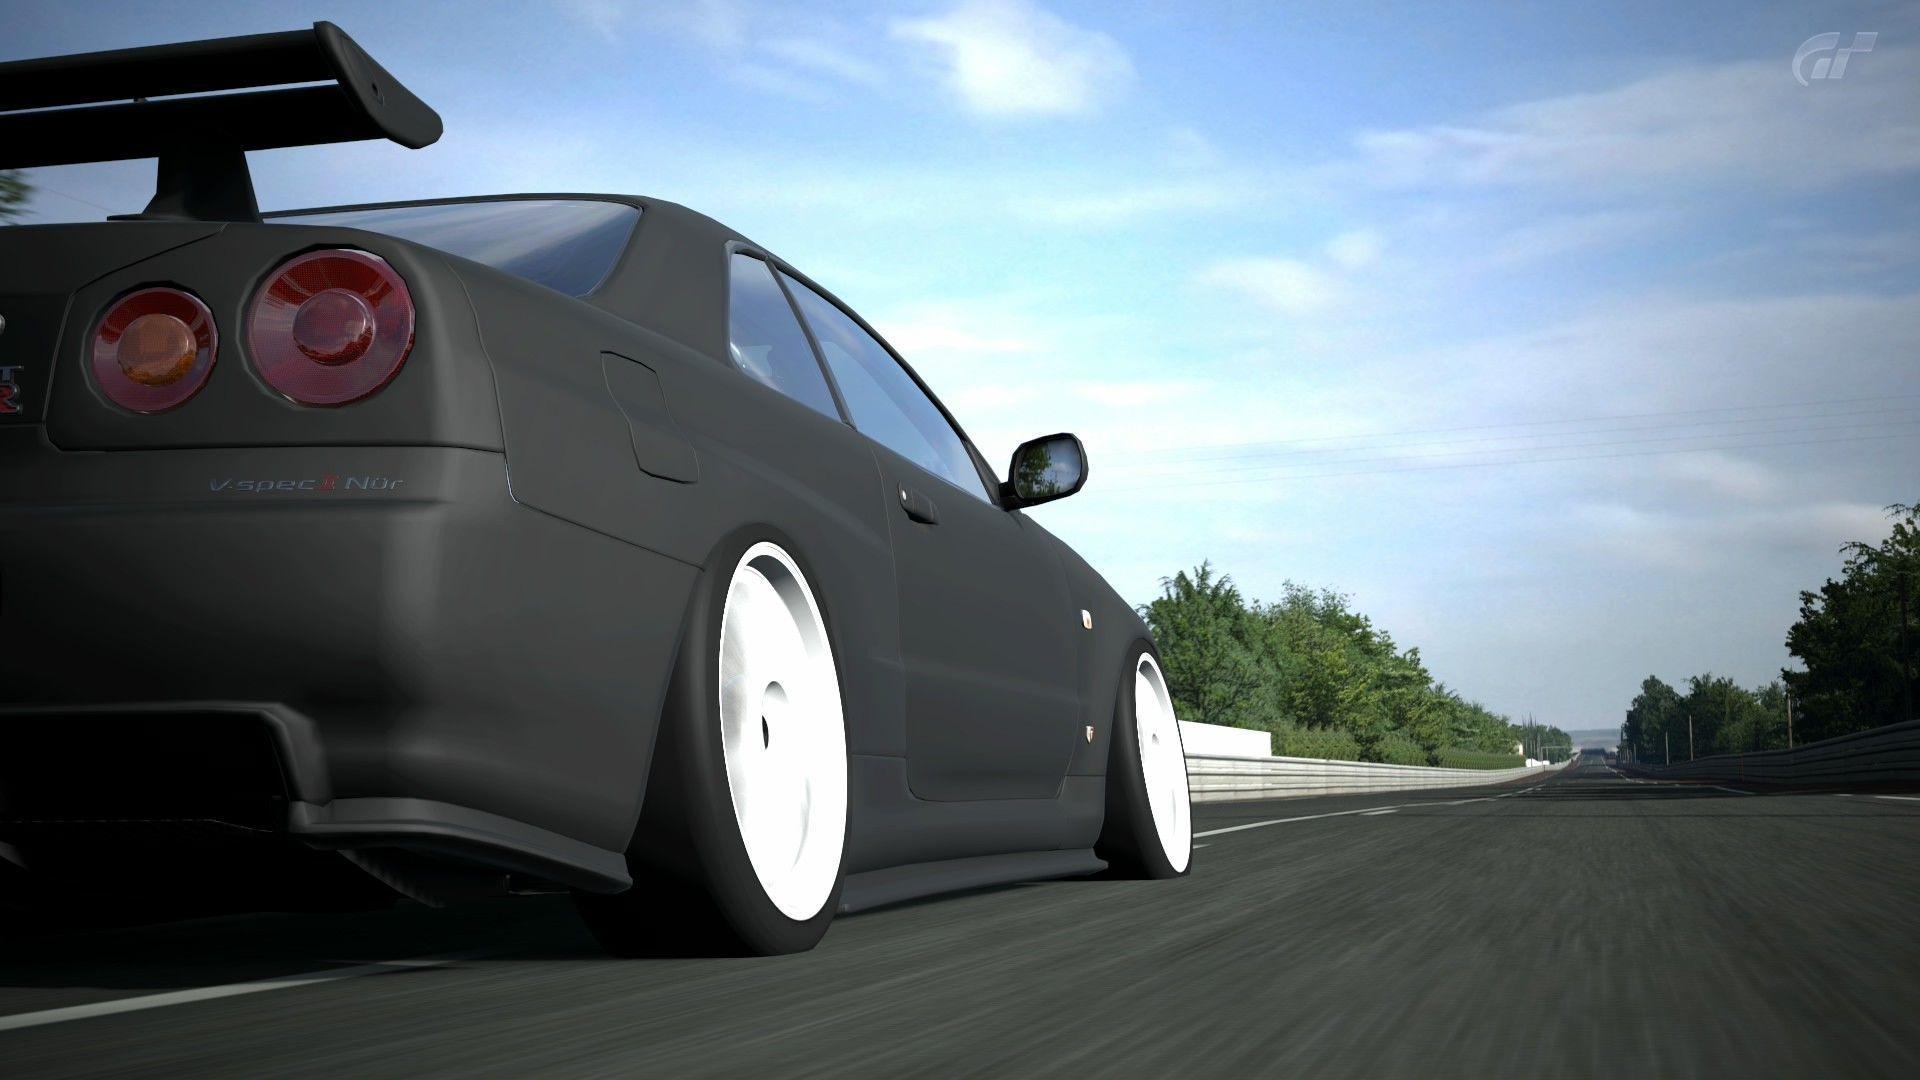 car, Nissan, Nissan Skyline, Nissan Skyline GT R R34 Wallpapers HD ...